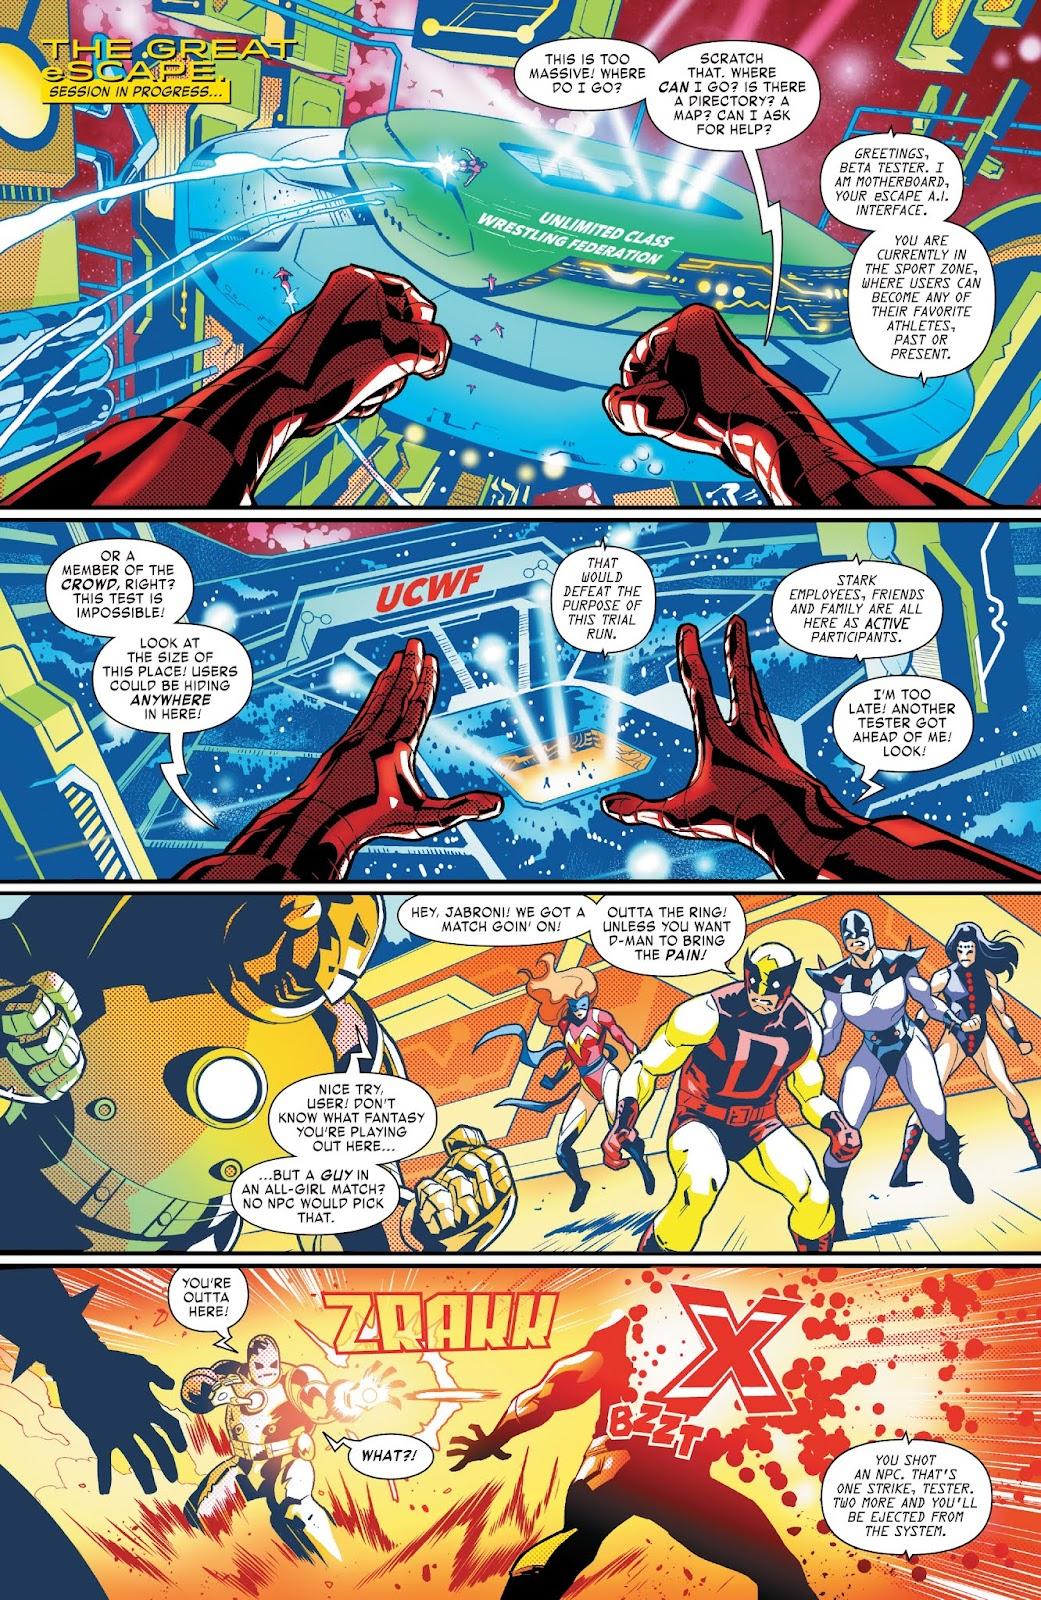 Read online Tony Stark: Iron Man comic -  Issue #3 - 9